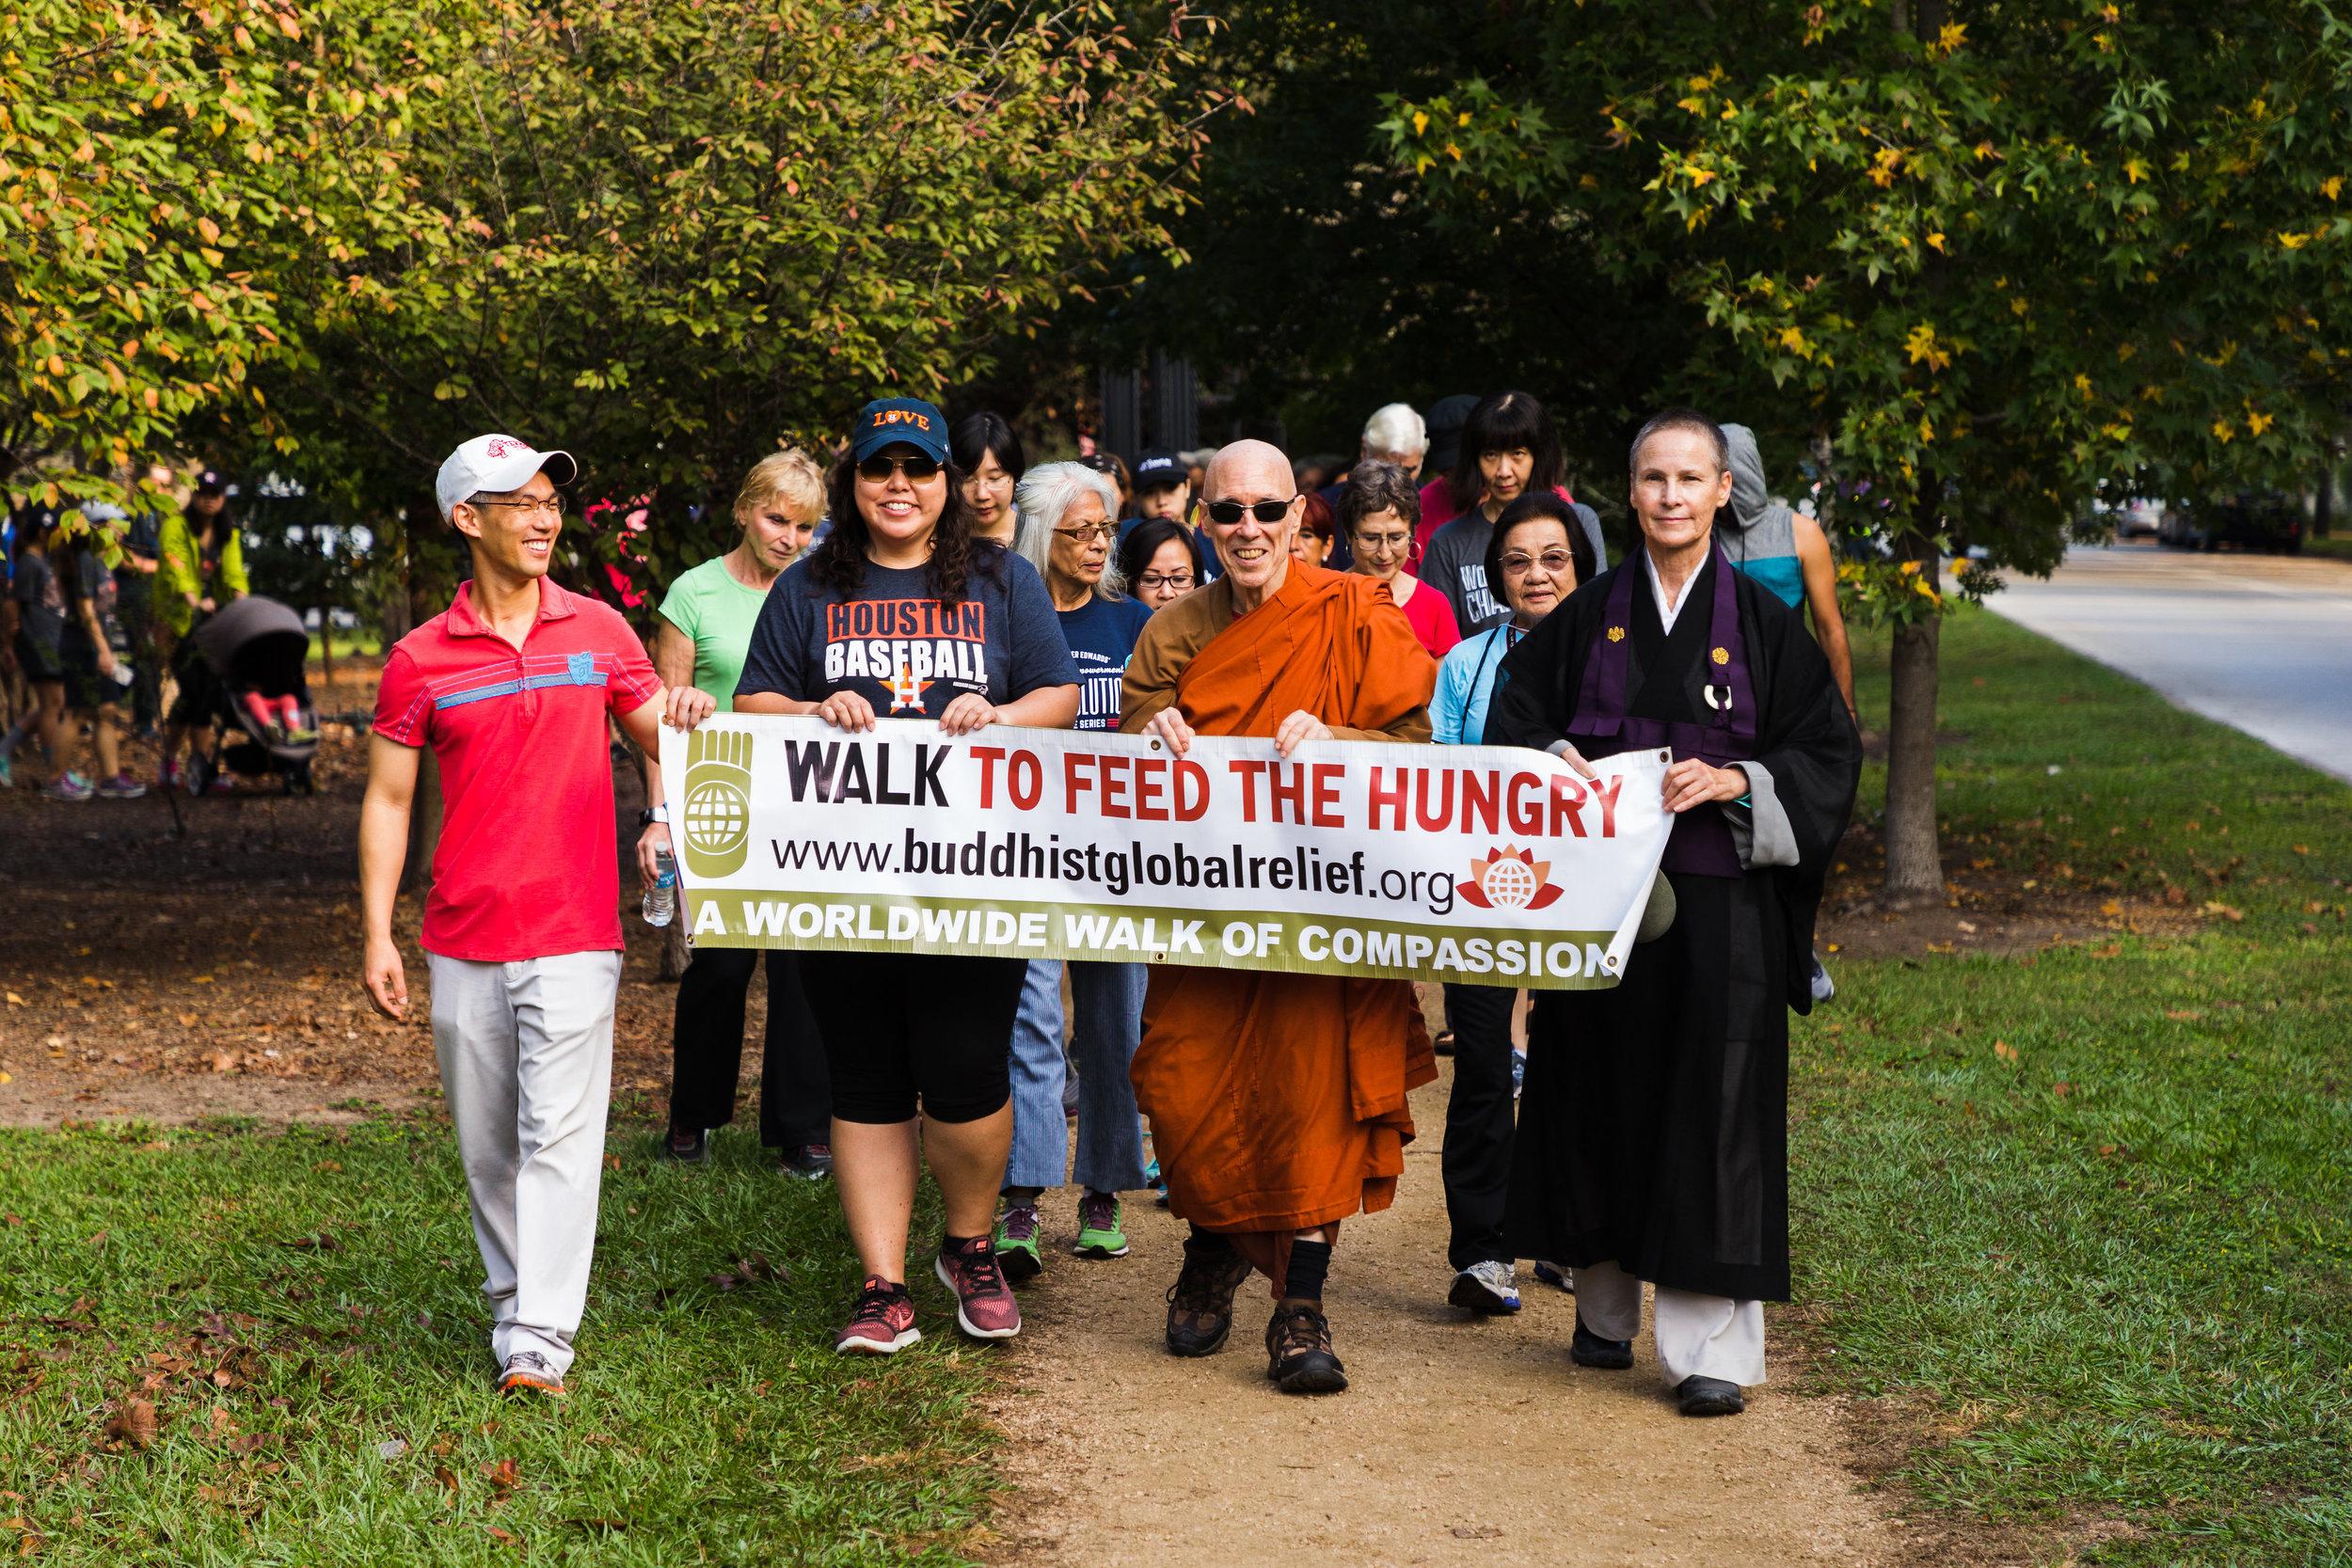 Bhikkhu-Bodhi-Global-Relief-Houston-Zen-Walk-42.jpg